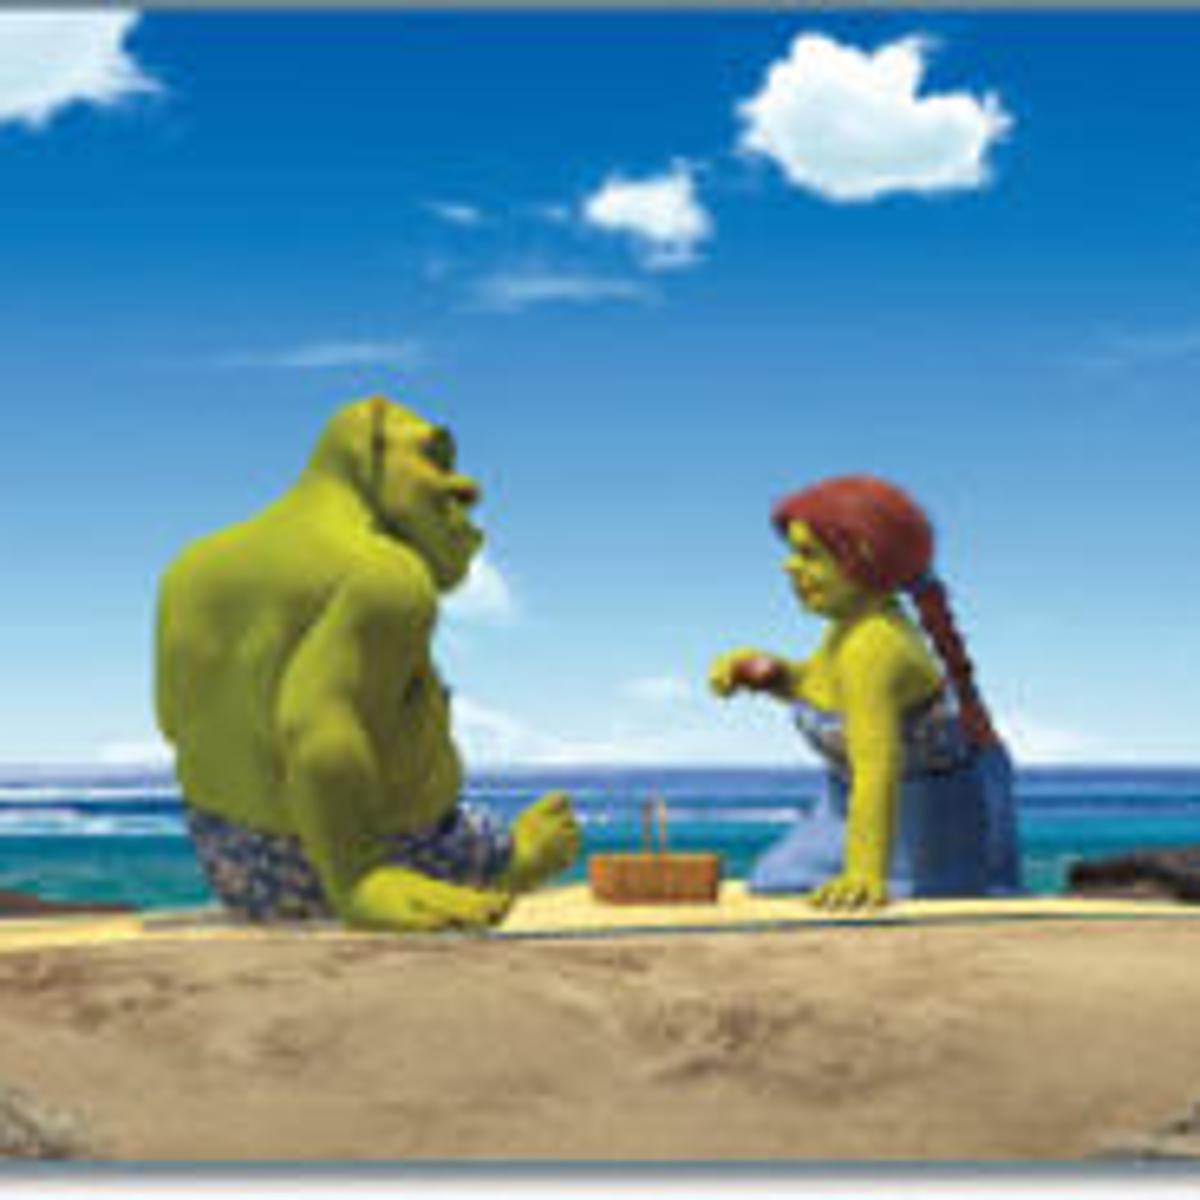 Dvd Review Shrek Ii Makes Audiences Shriek With Laughter Archive Tulsaworld Com